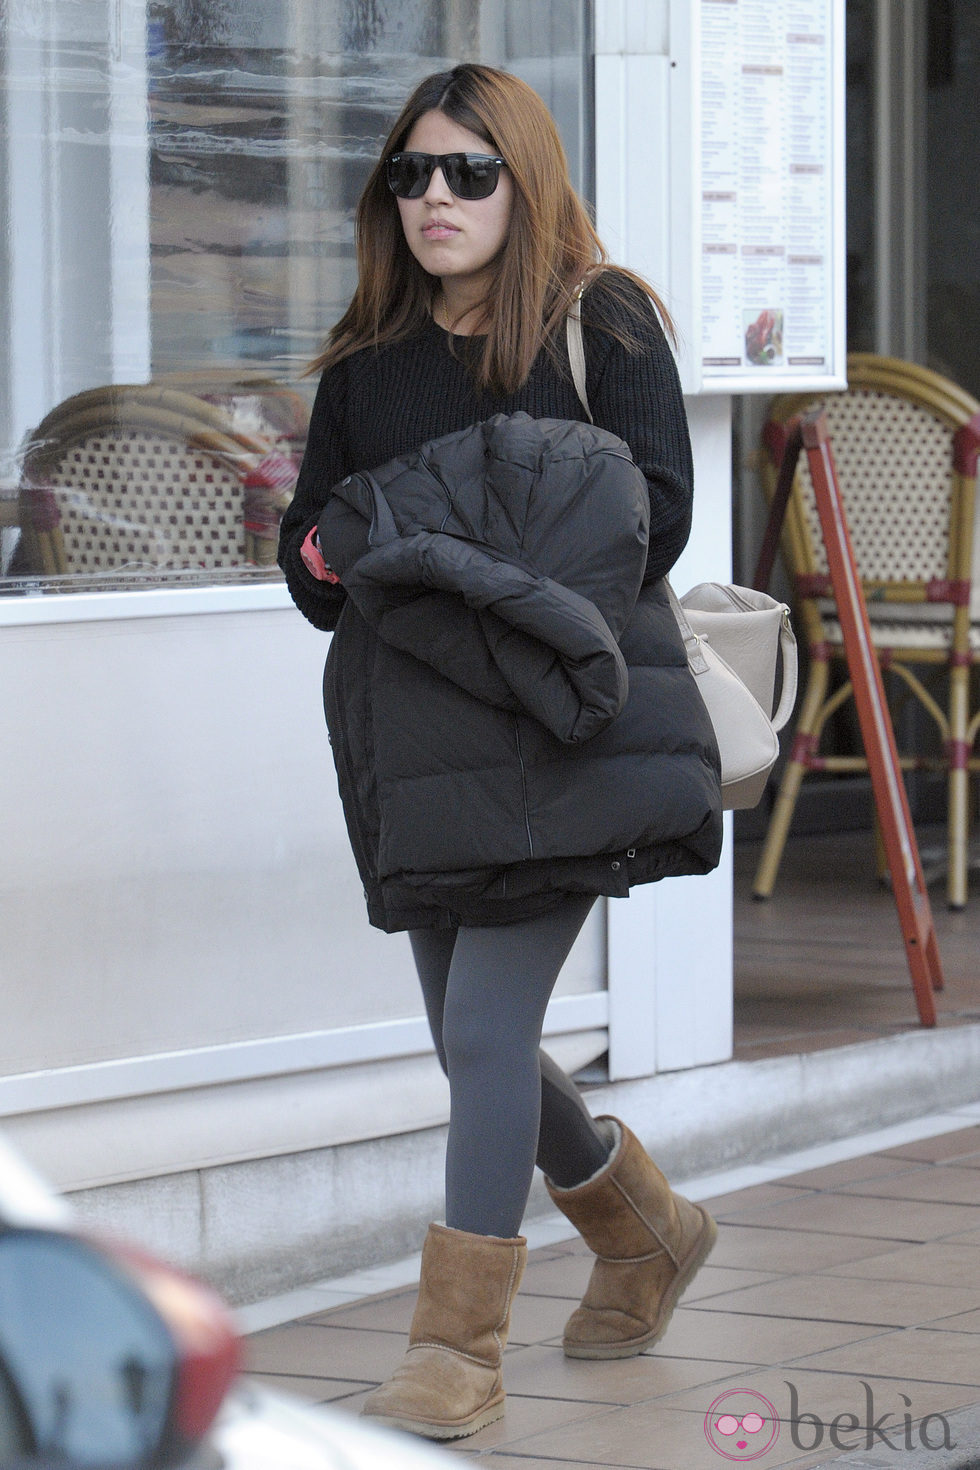 Chabelita Pantoja paseando su embarazo por Marbella